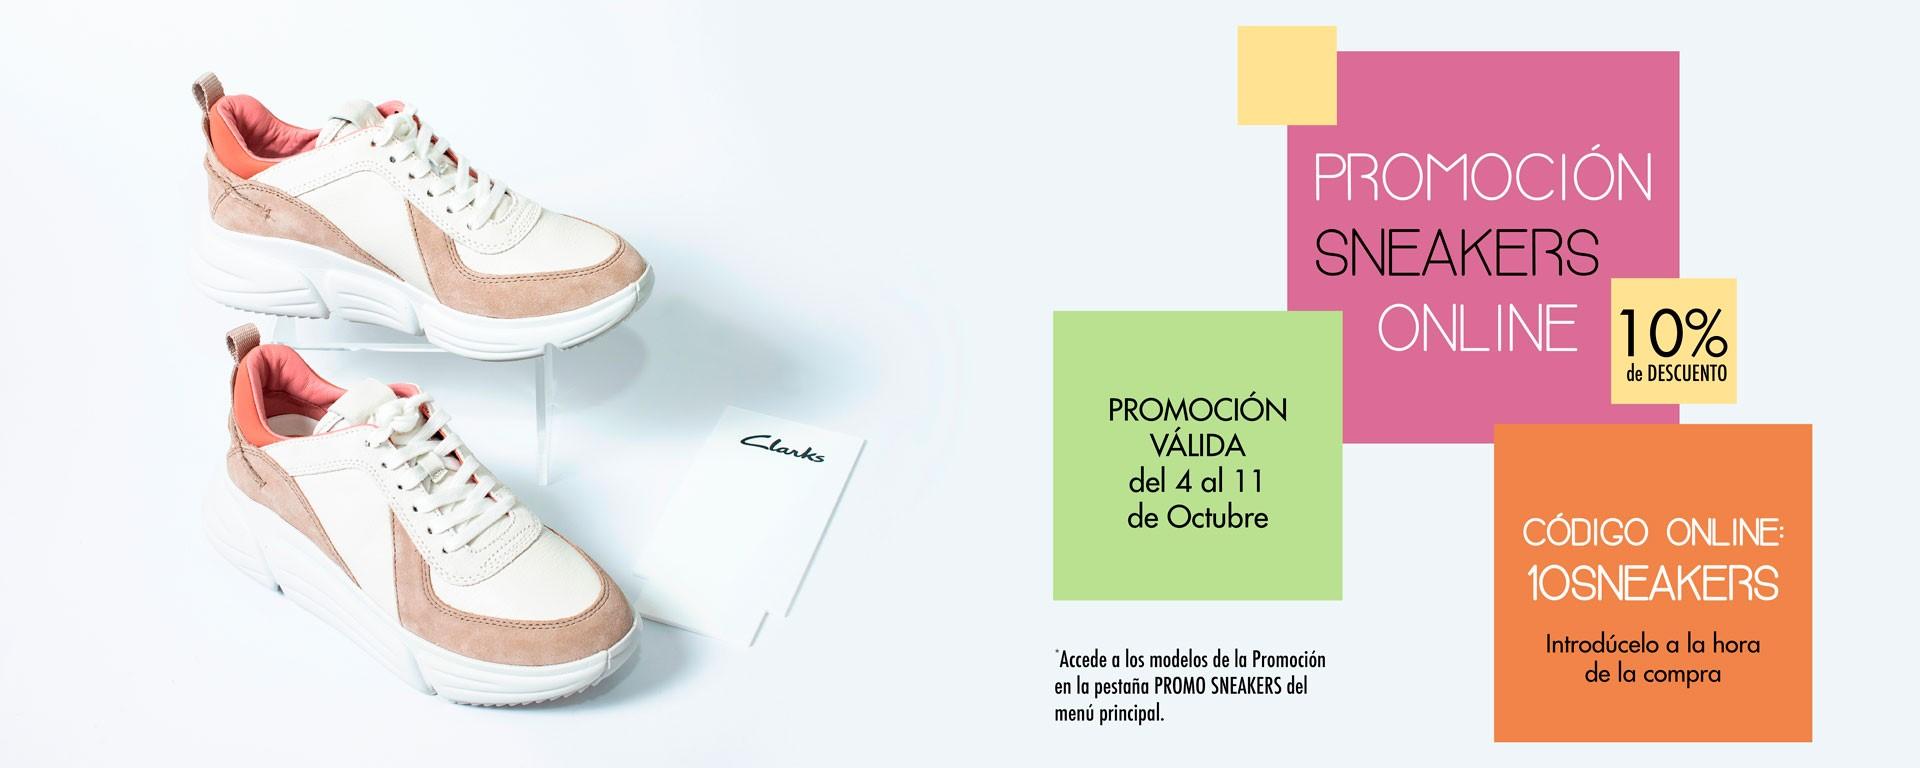 Promo-sneakers